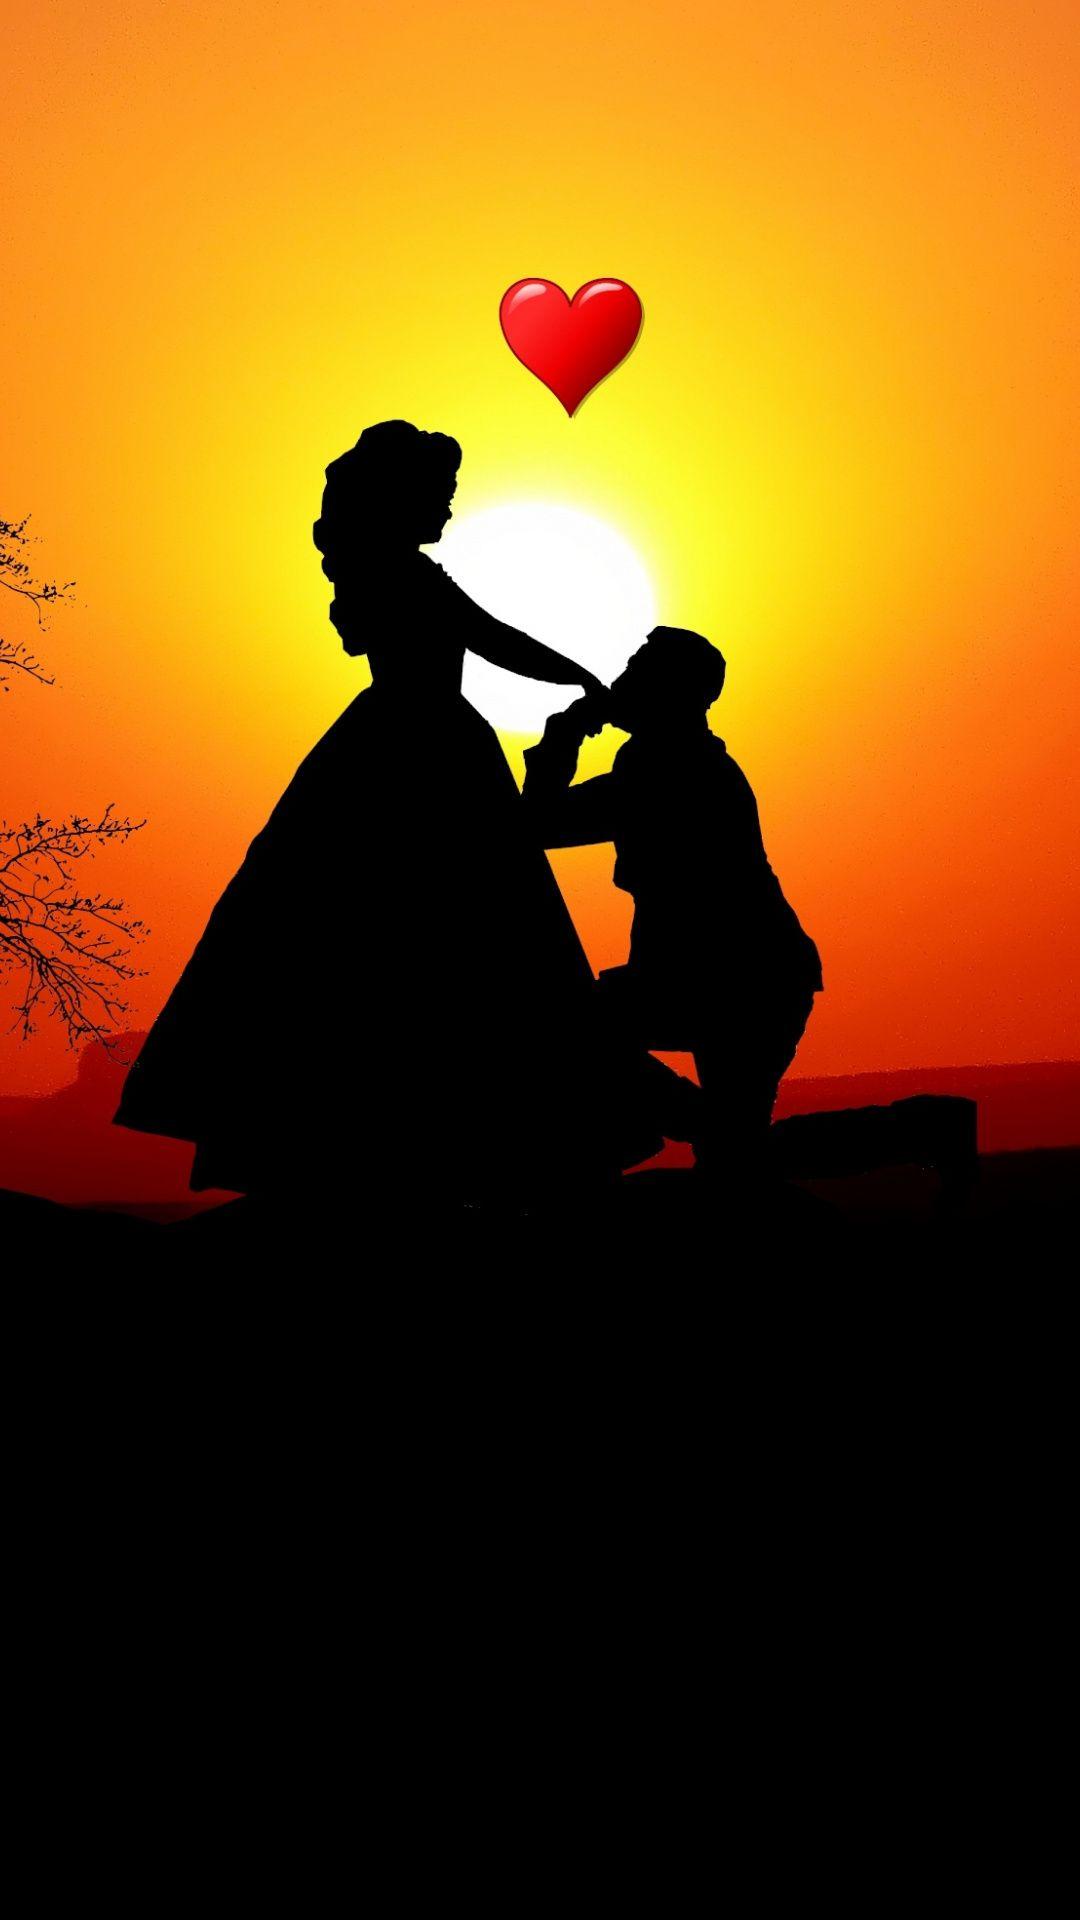 Couple Love Silhouette Sunset Romantic Wallpaper Romantic Wallpaper Love Wallpaper Backgrounds Love Couple Wallpaper